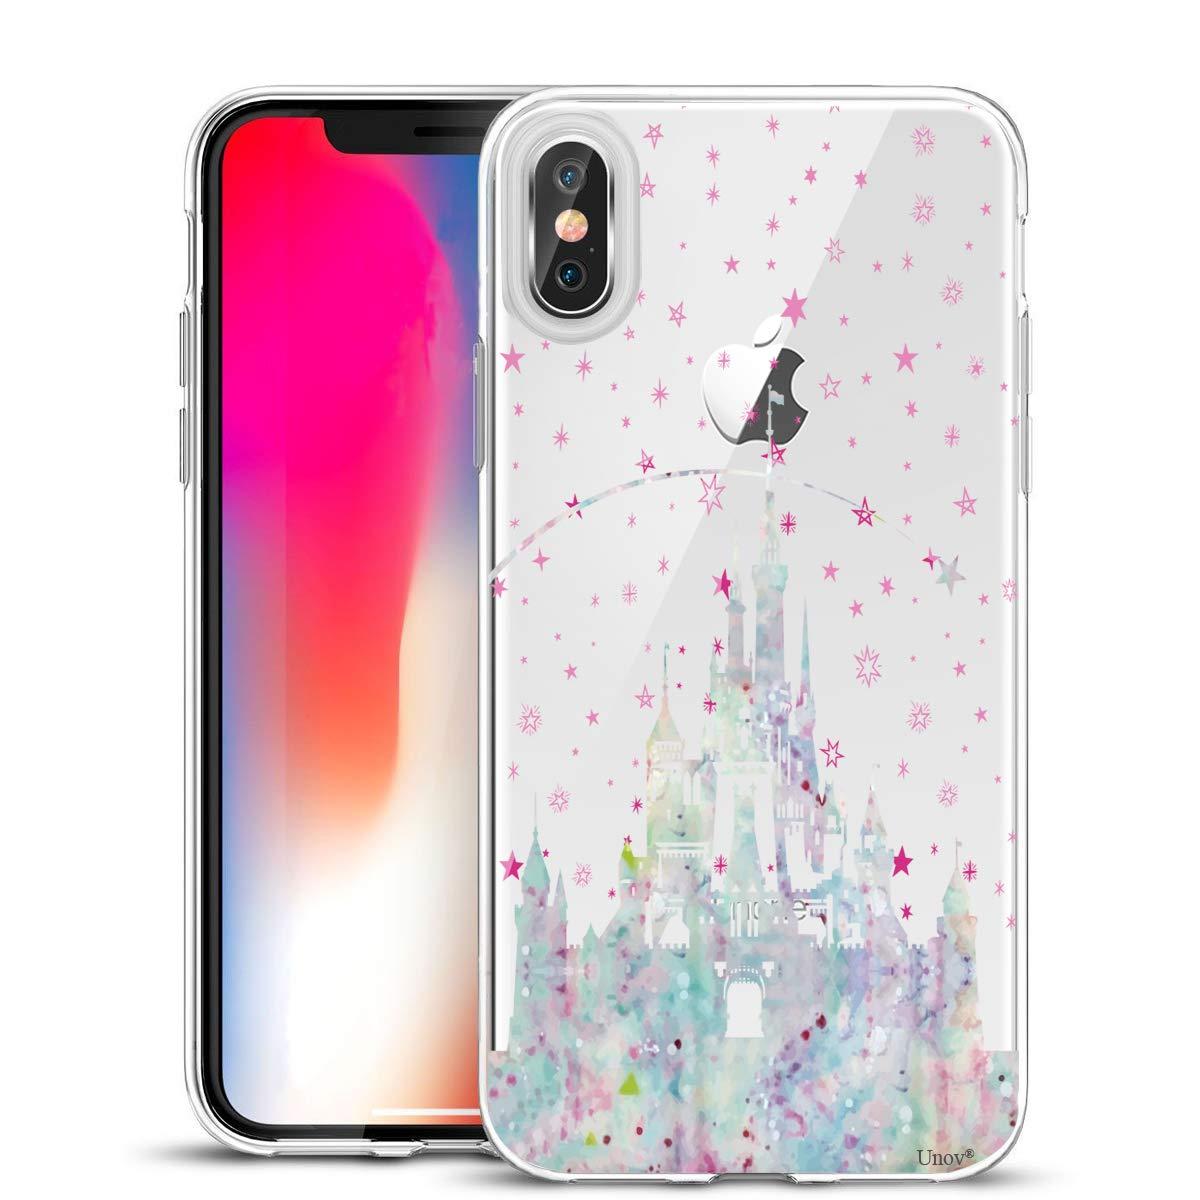 Funda para Iphone Xs Max UNOV (7H2L2BPQ)